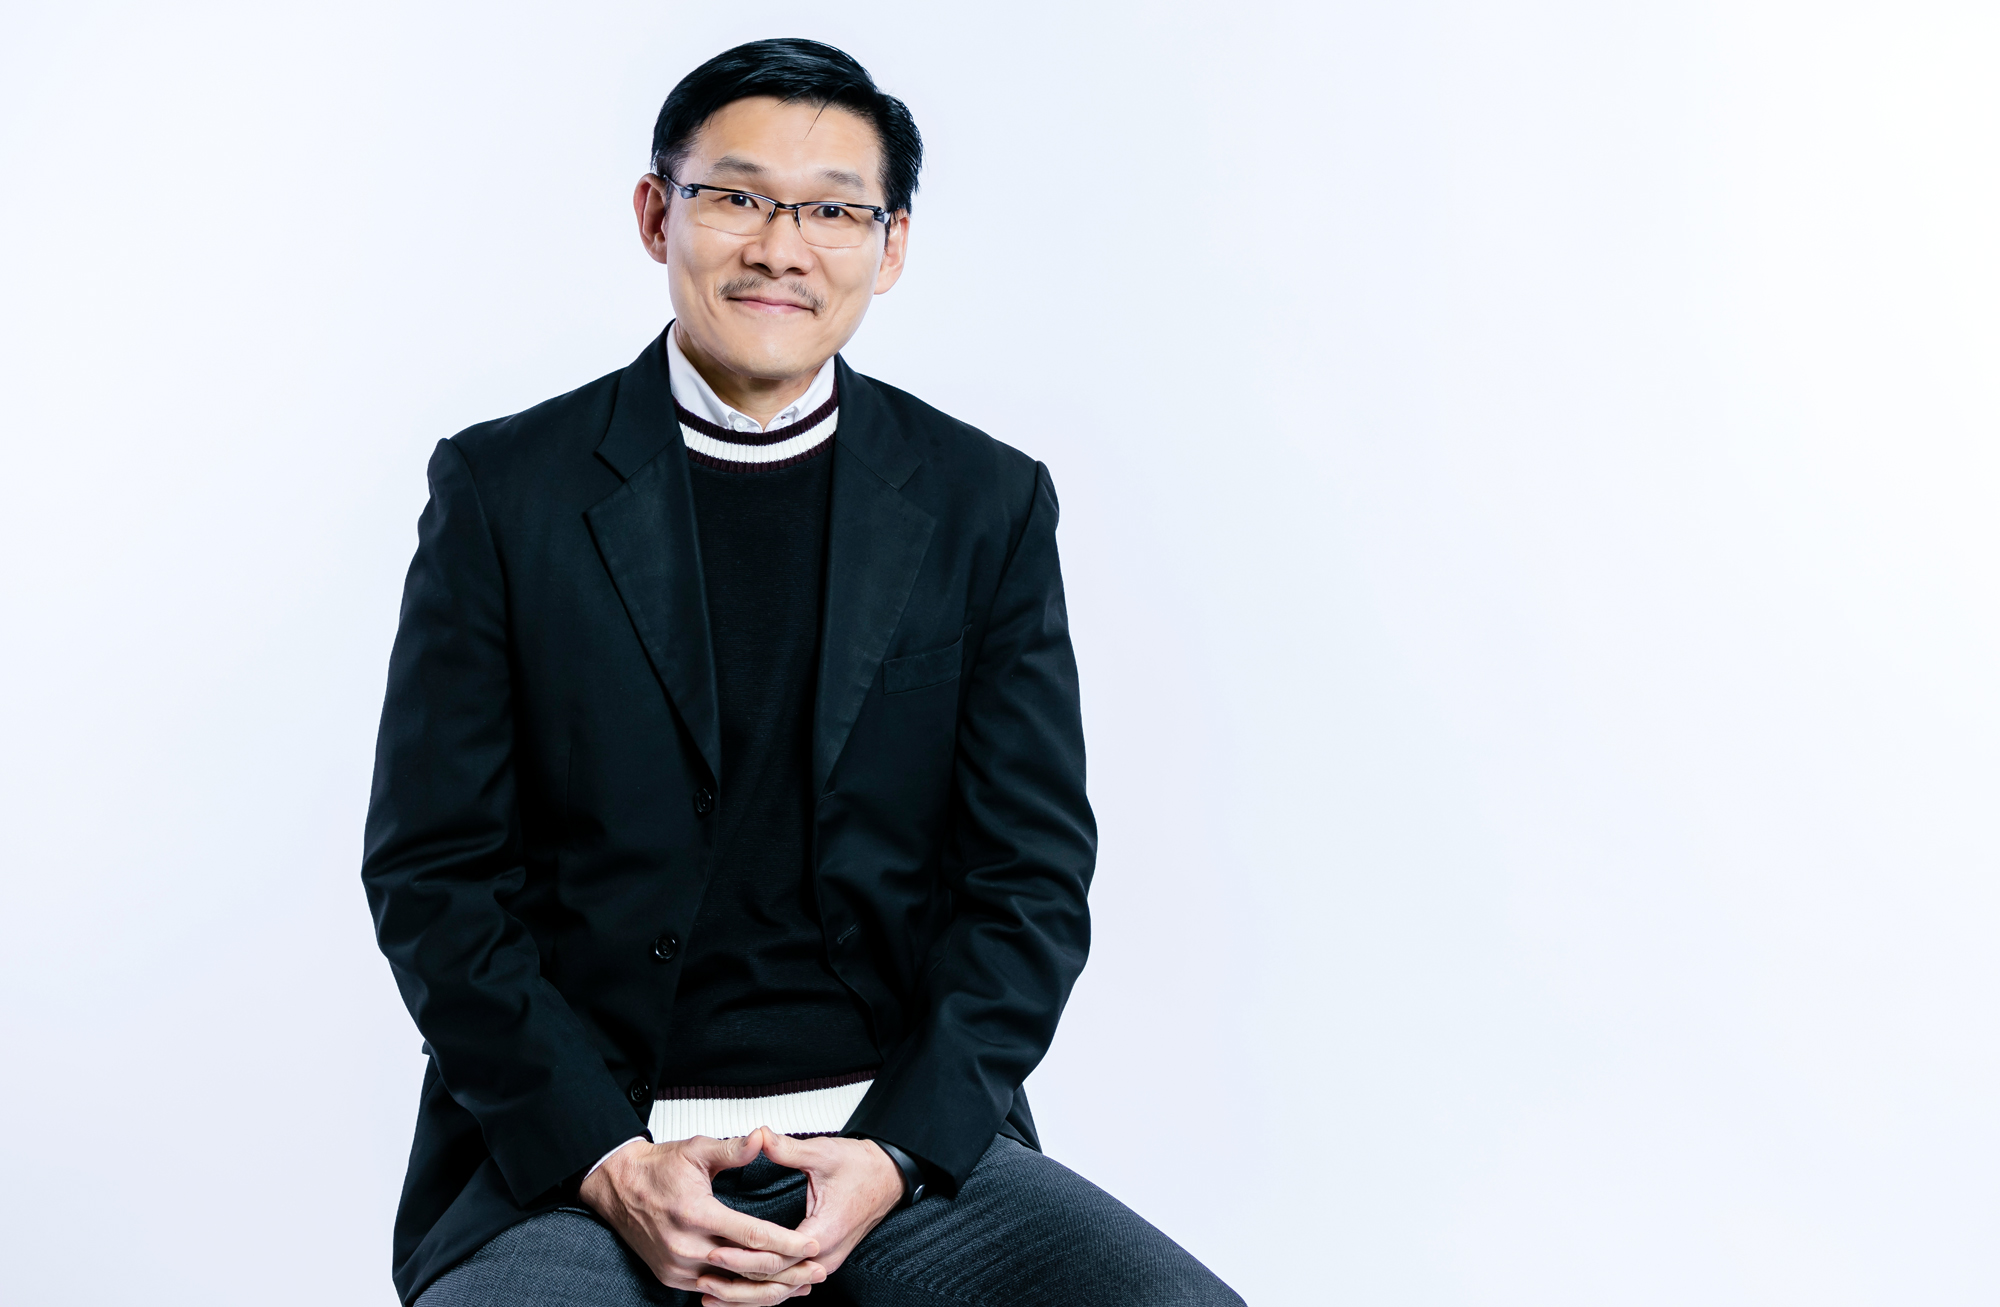 Li & Fung's new ceo Joseph Phi